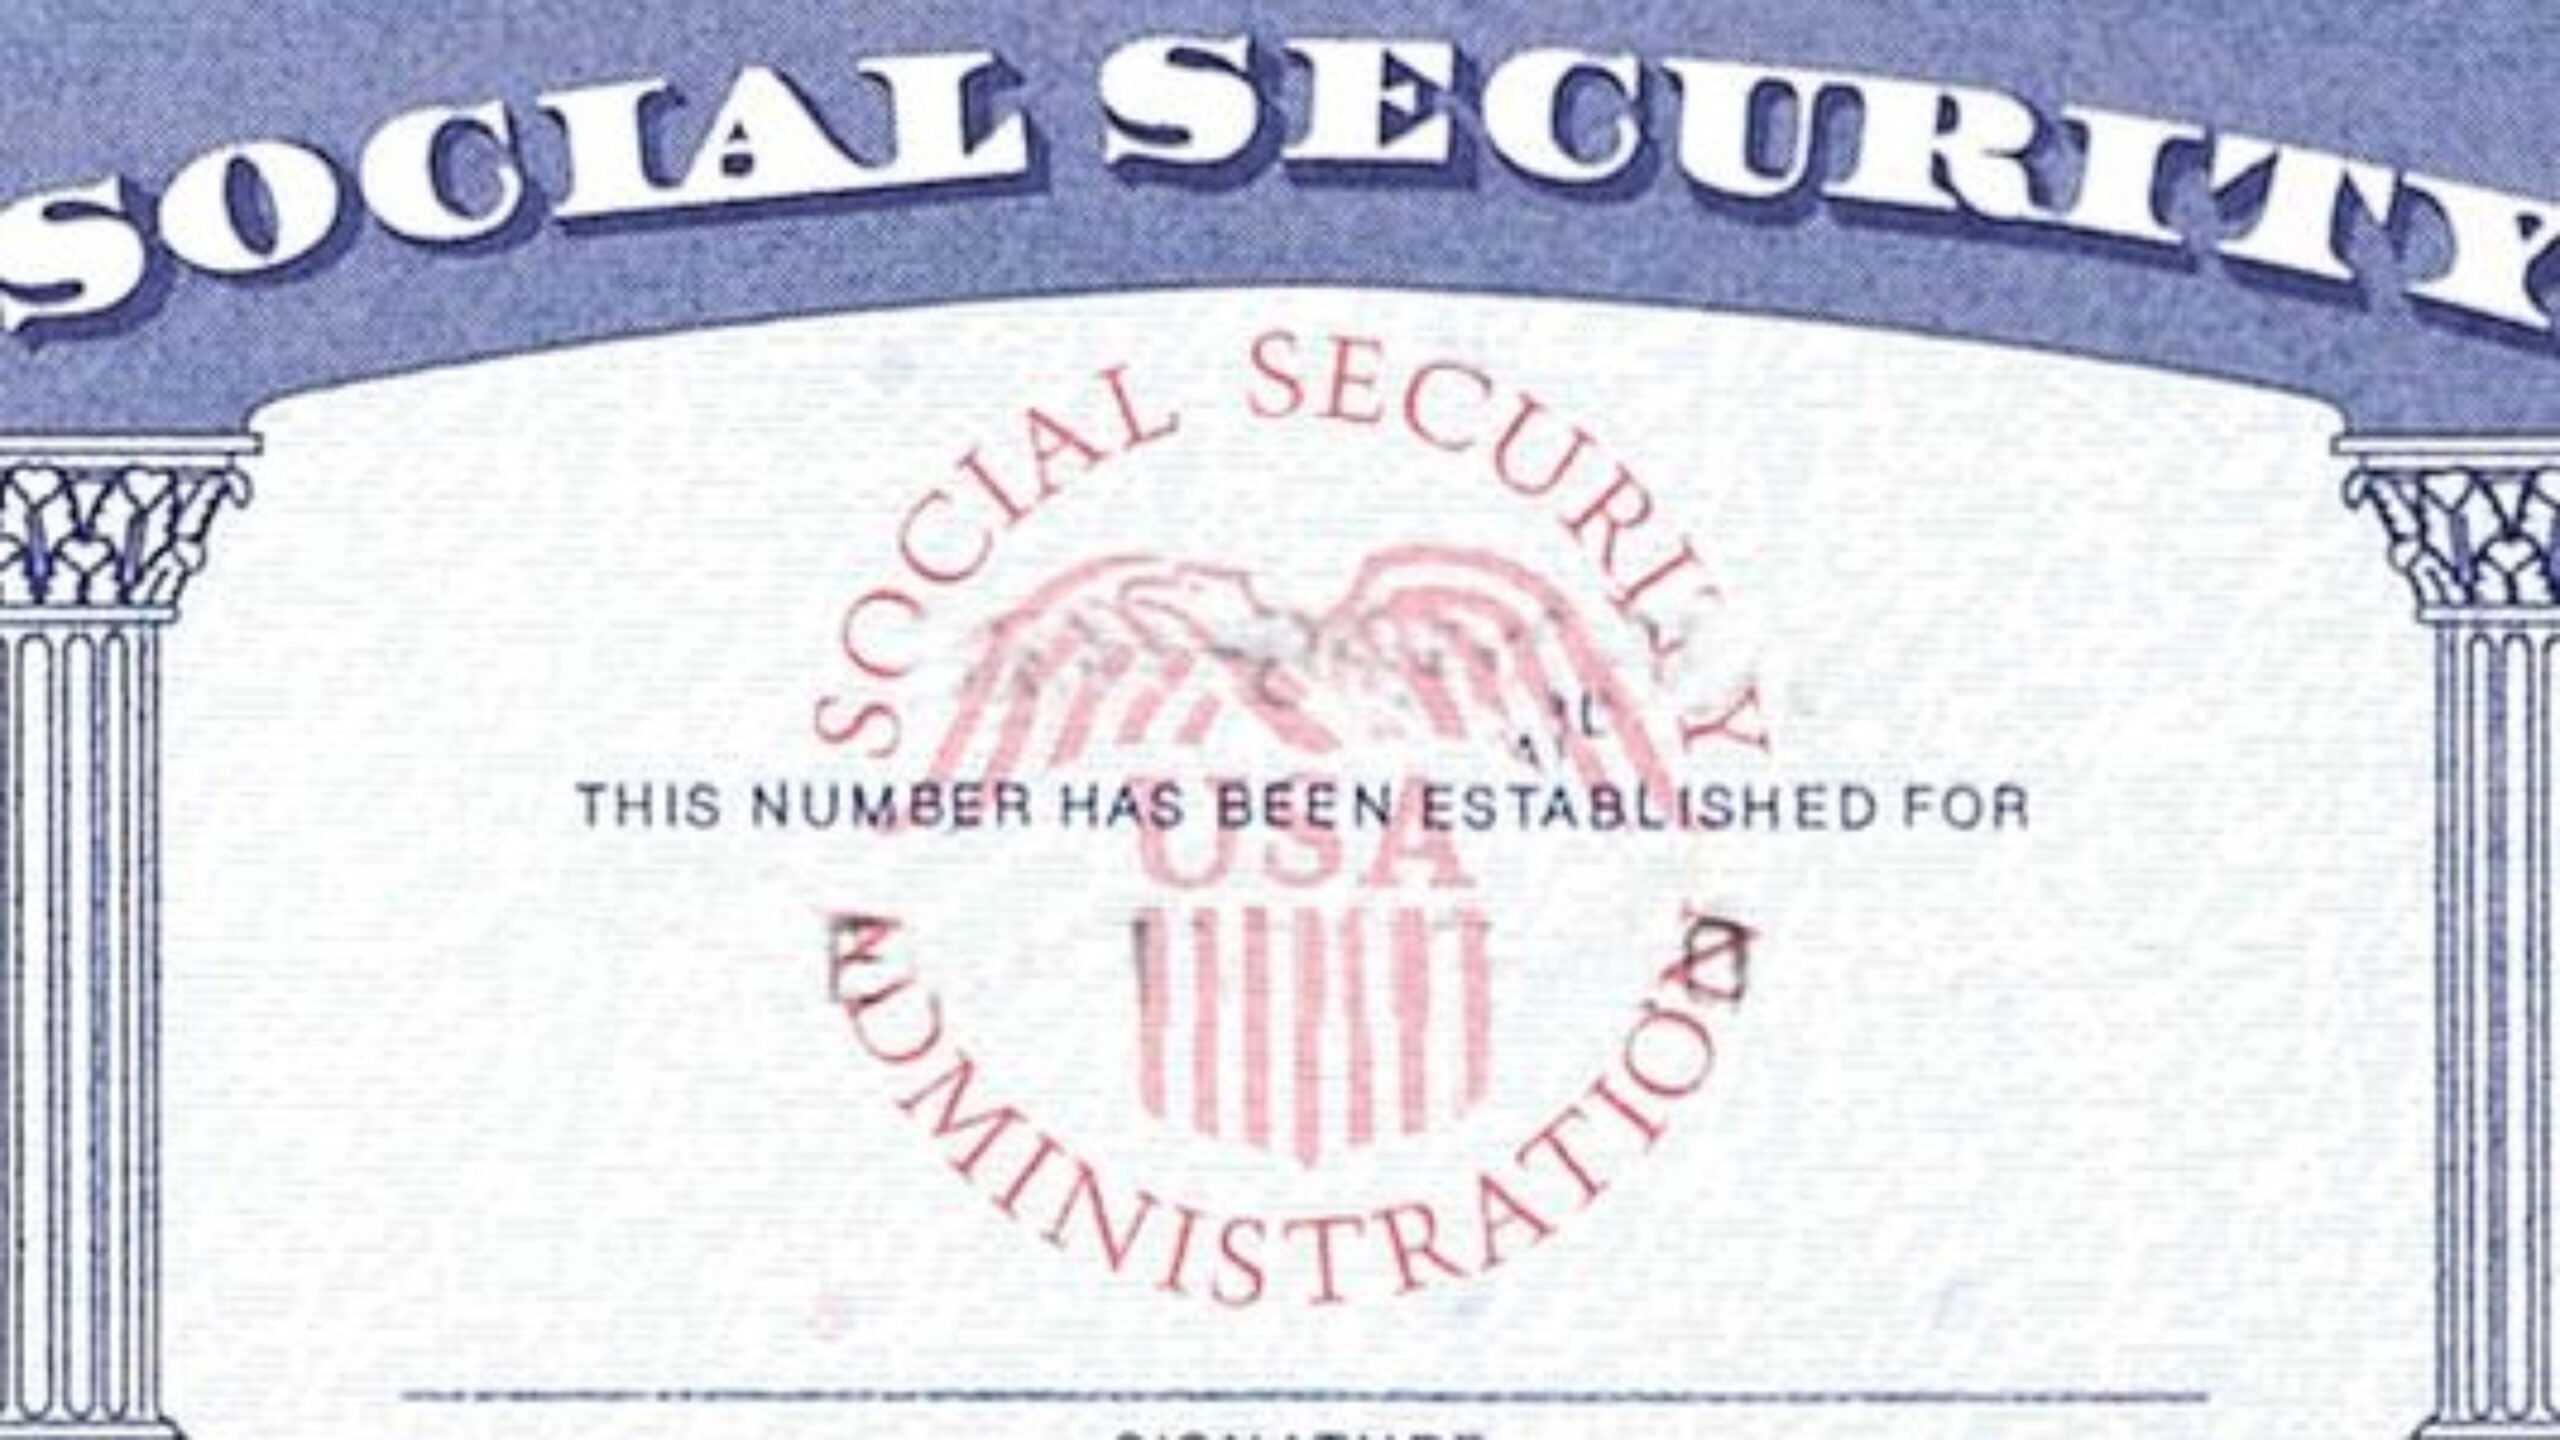 7 Social Security Card Template Psd Images - Social Security With Blank Social Security Card Template